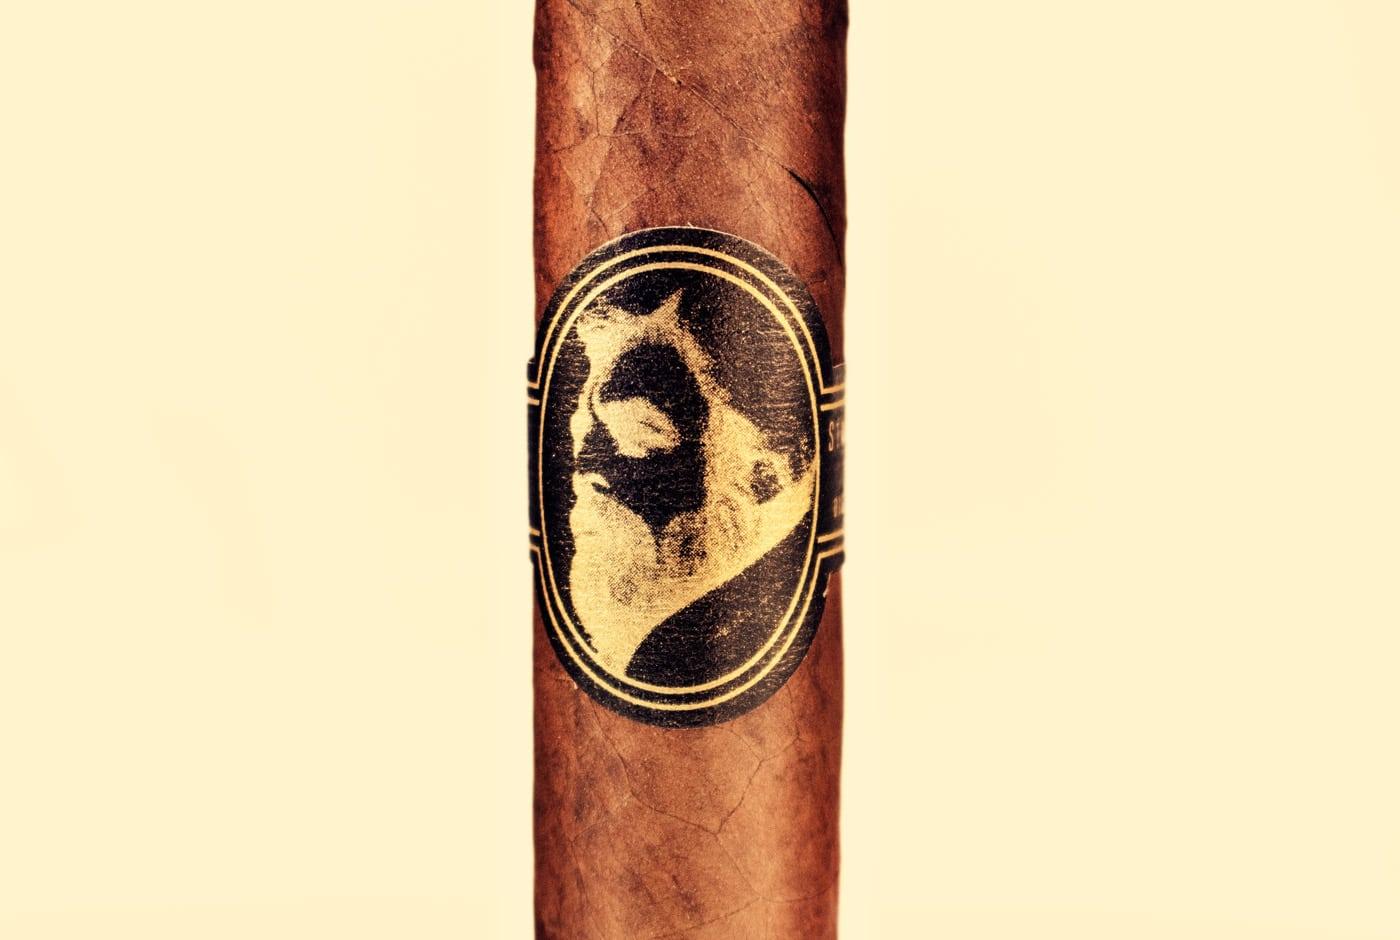 Caldwell Eastern Standard Maduro Midnight Express Jockey Club Robusto cigar review